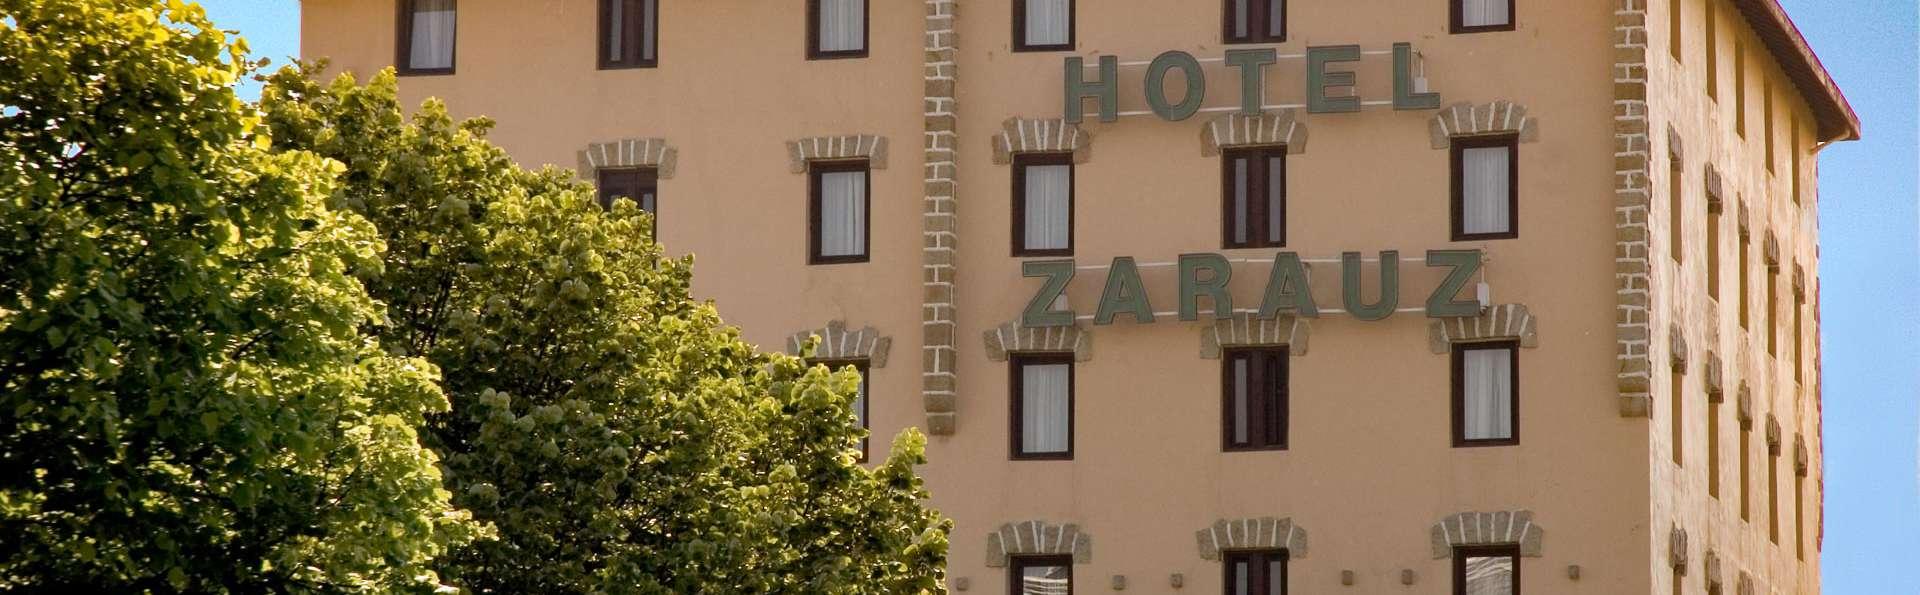 Hotel Zarauz  - EDIT_FRONT_01.jpg